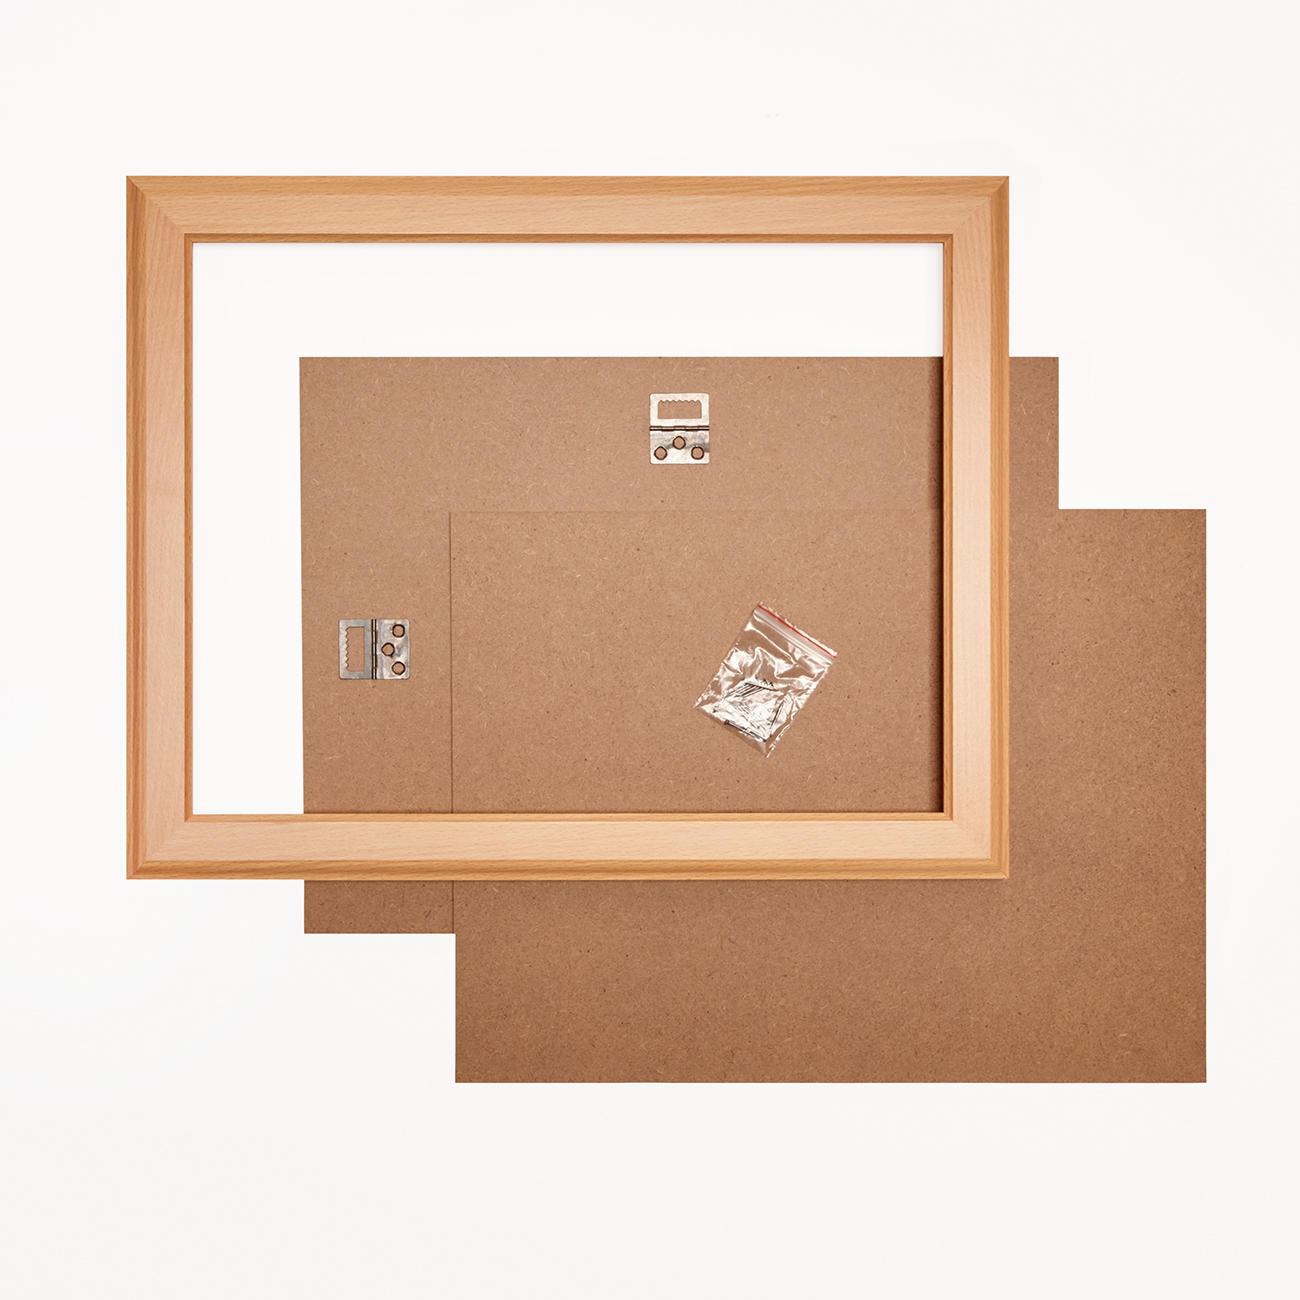 bilderrahmen buchefarben verschiedene gr en. Black Bedroom Furniture Sets. Home Design Ideas